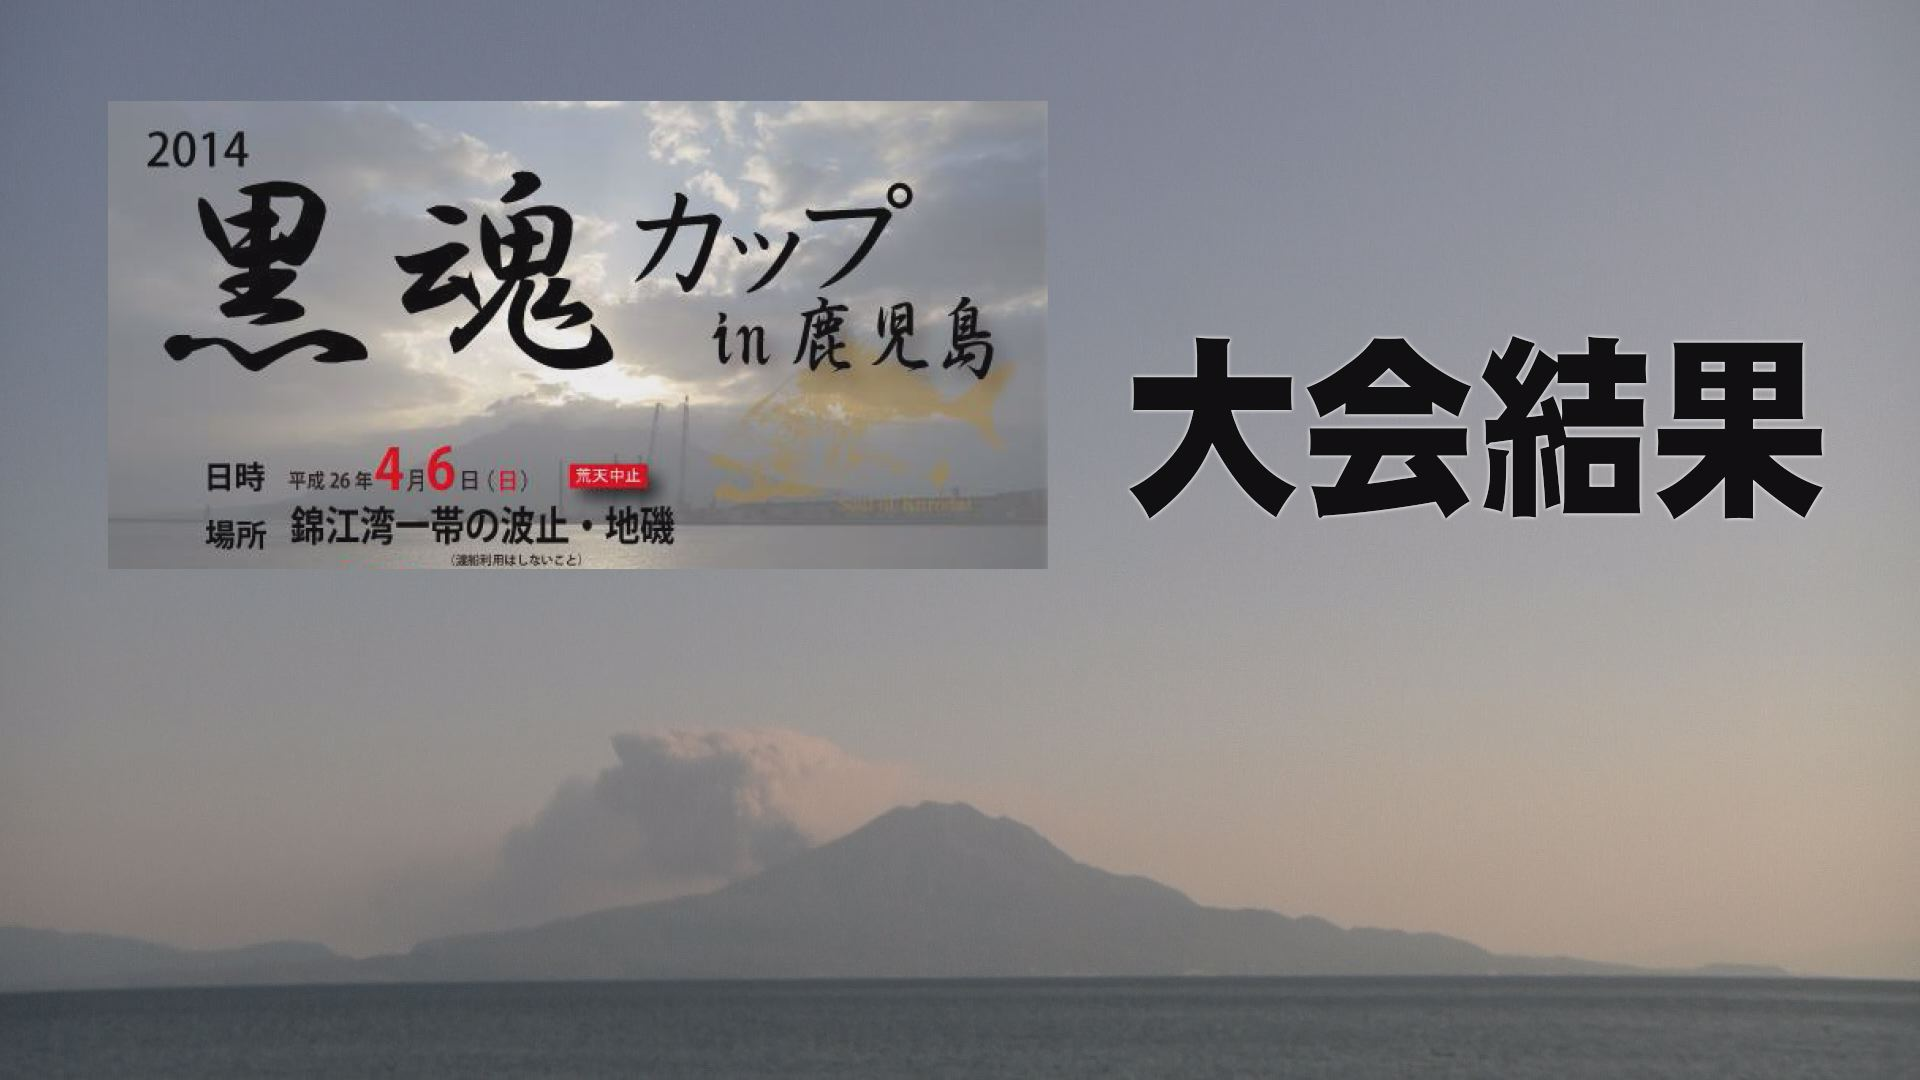 2014 黒魂カップ・鹿児島大会/結果